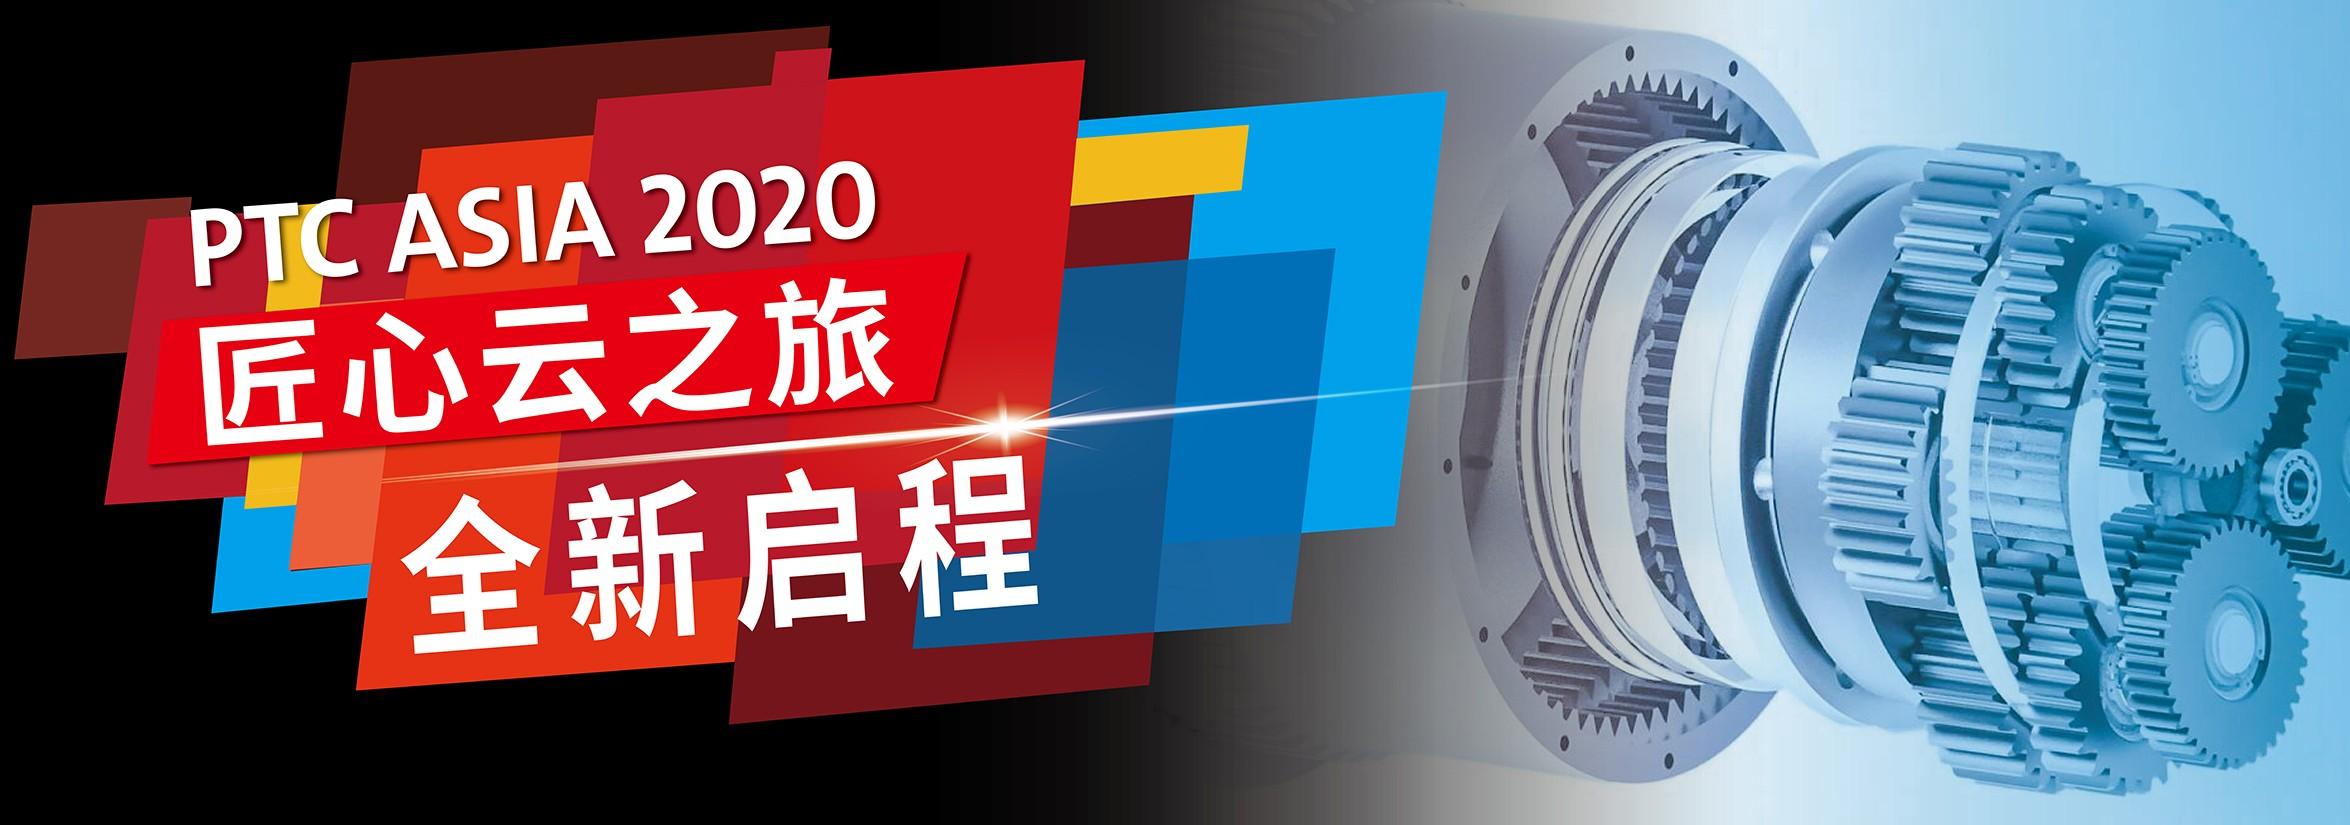 20ptc-匠心之旅-banner-2350-825 -cn_画板 1 副本 11.jpg